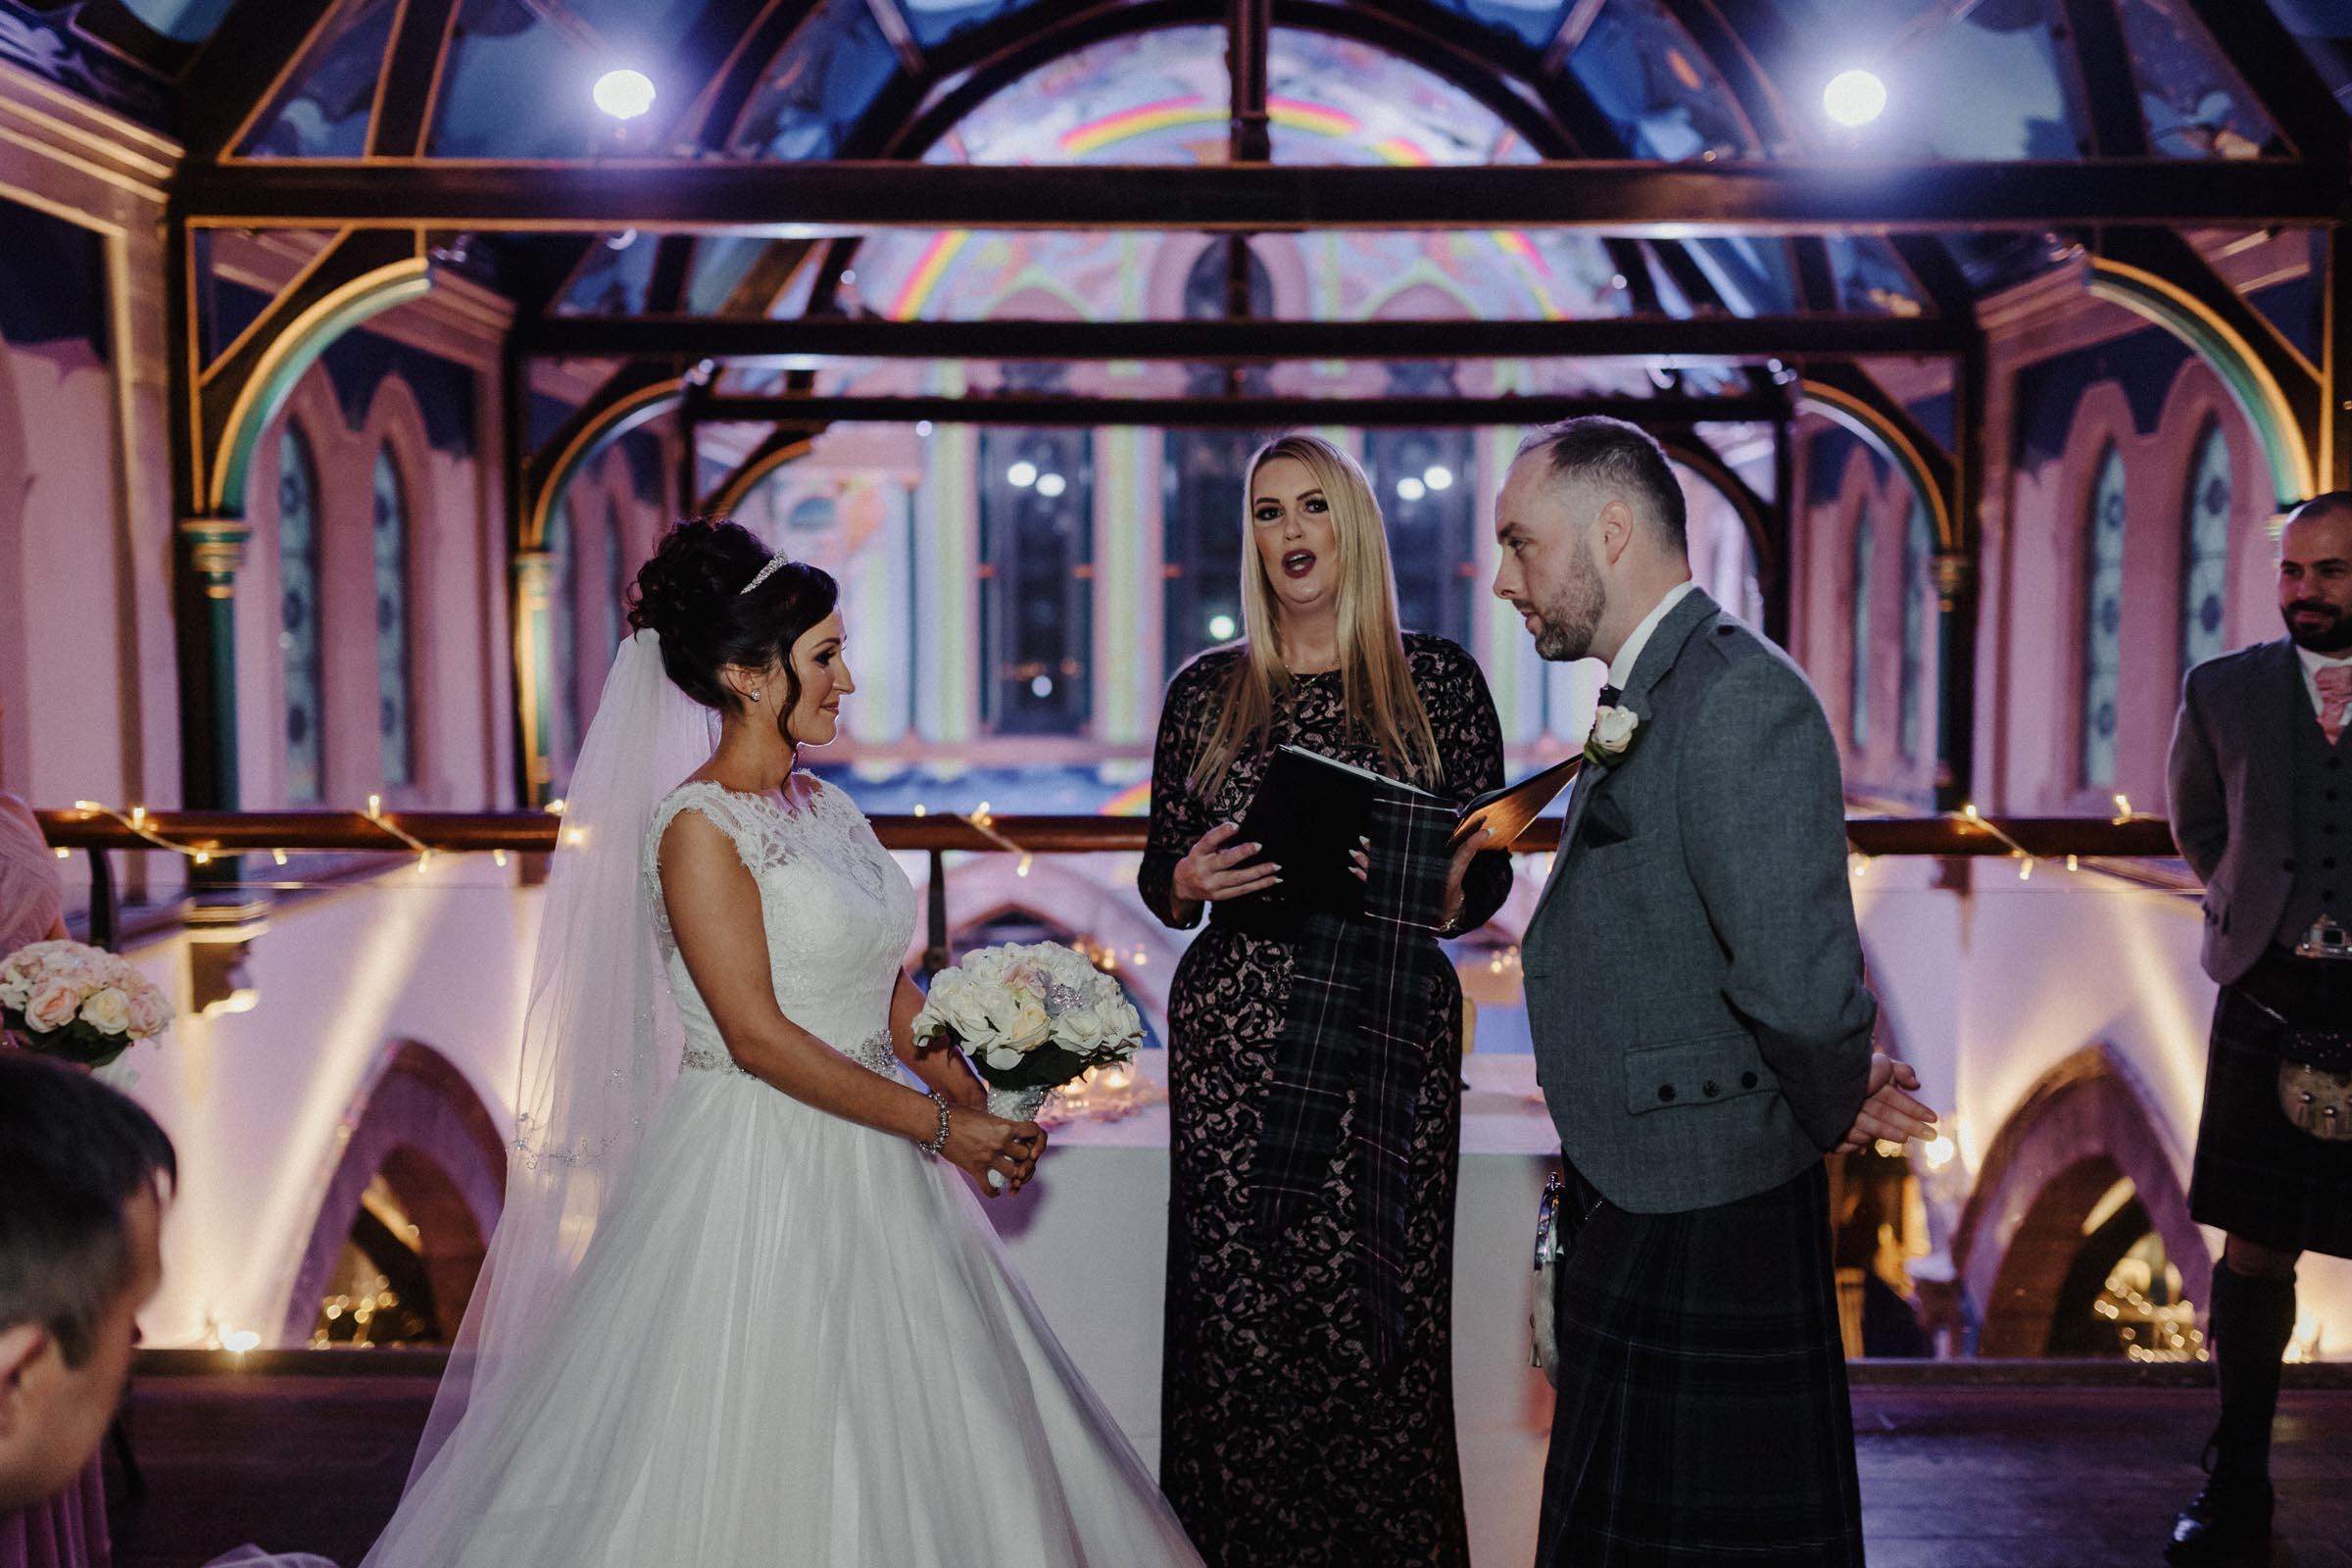 Oran-Mor-Wedding-Photographer-DearlyPhotography (14 of 55).jpg